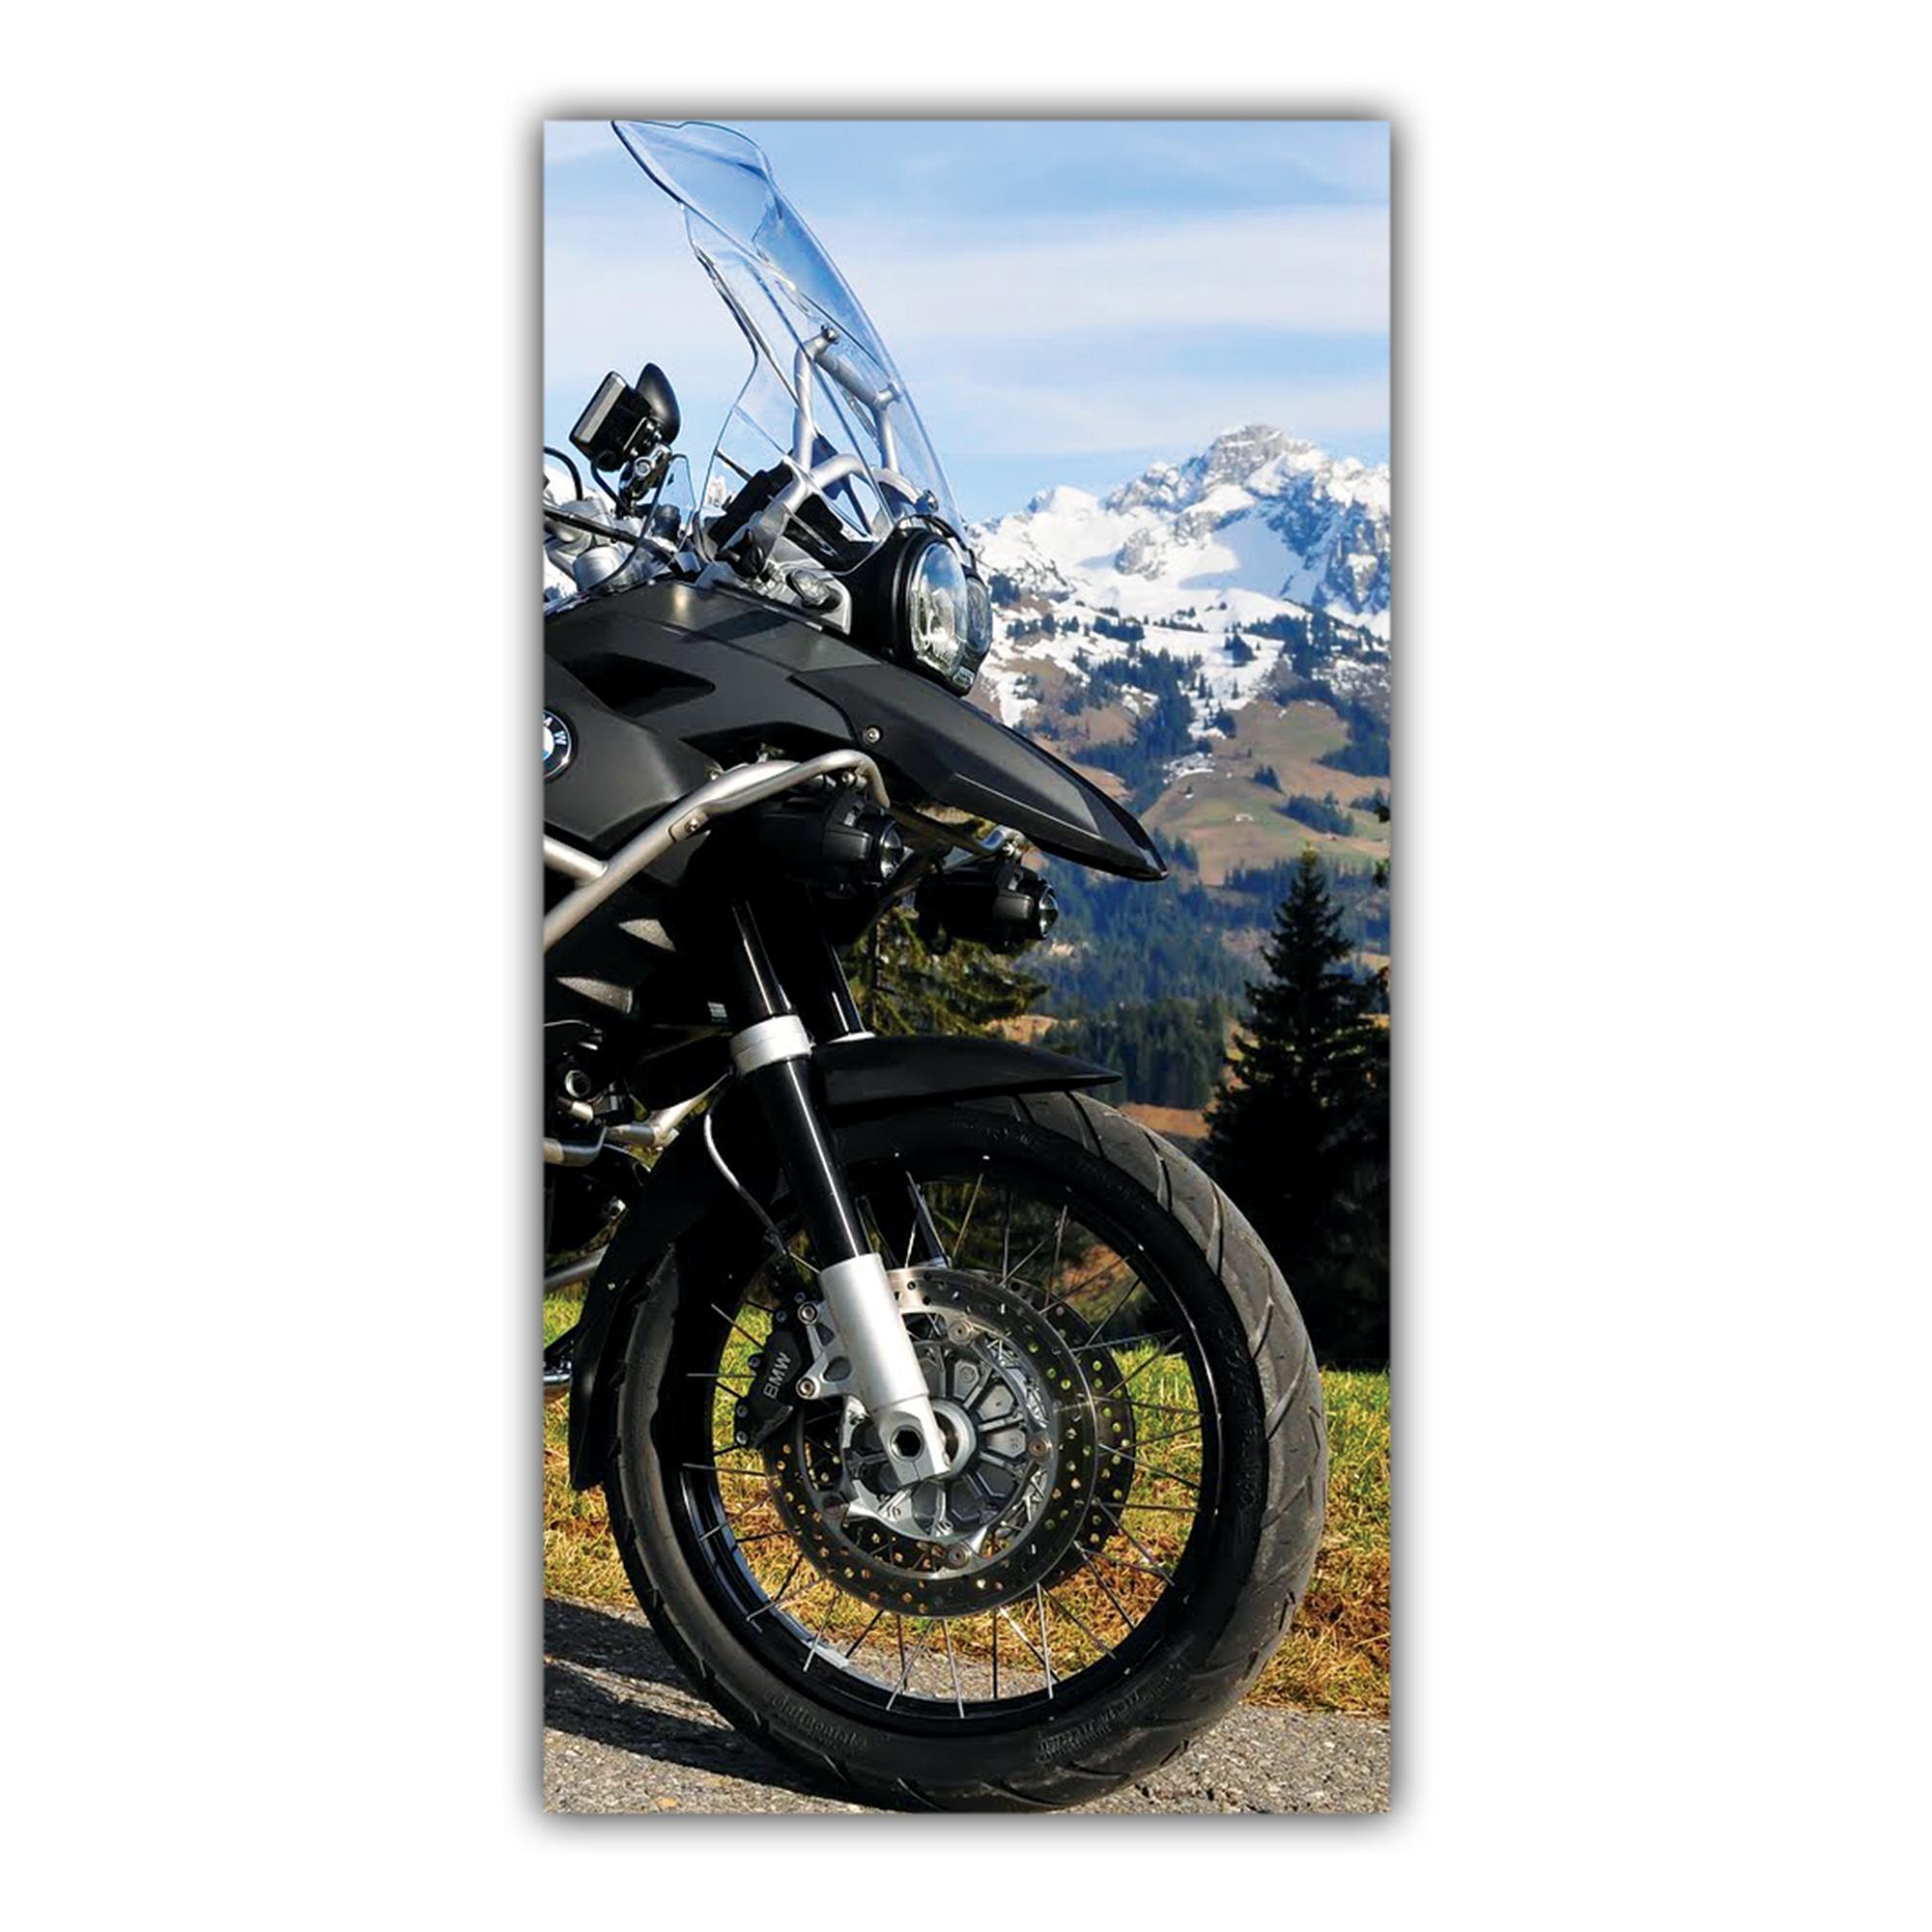 BMW 1200 GS Trail Paysage Montagne Neige